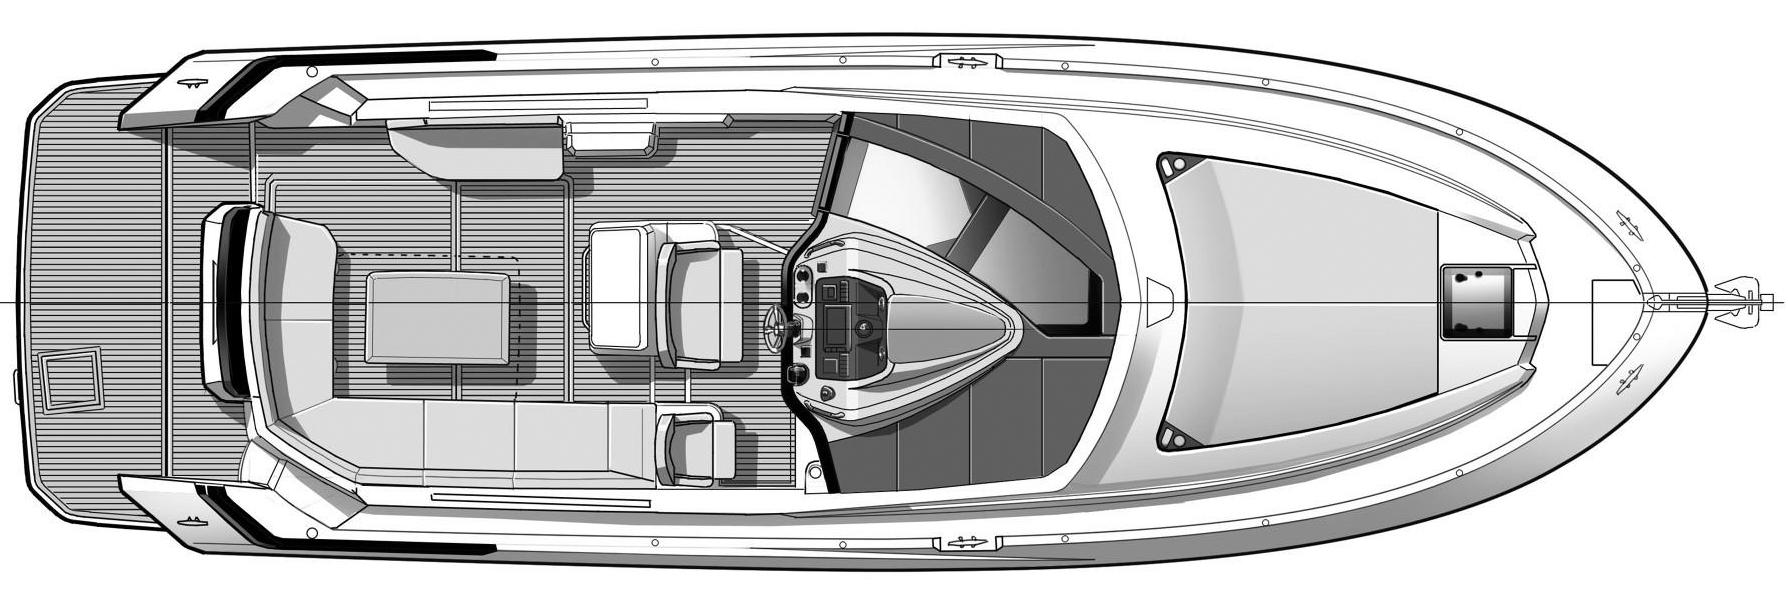 Gran Turismo 40 Floor Plan 2